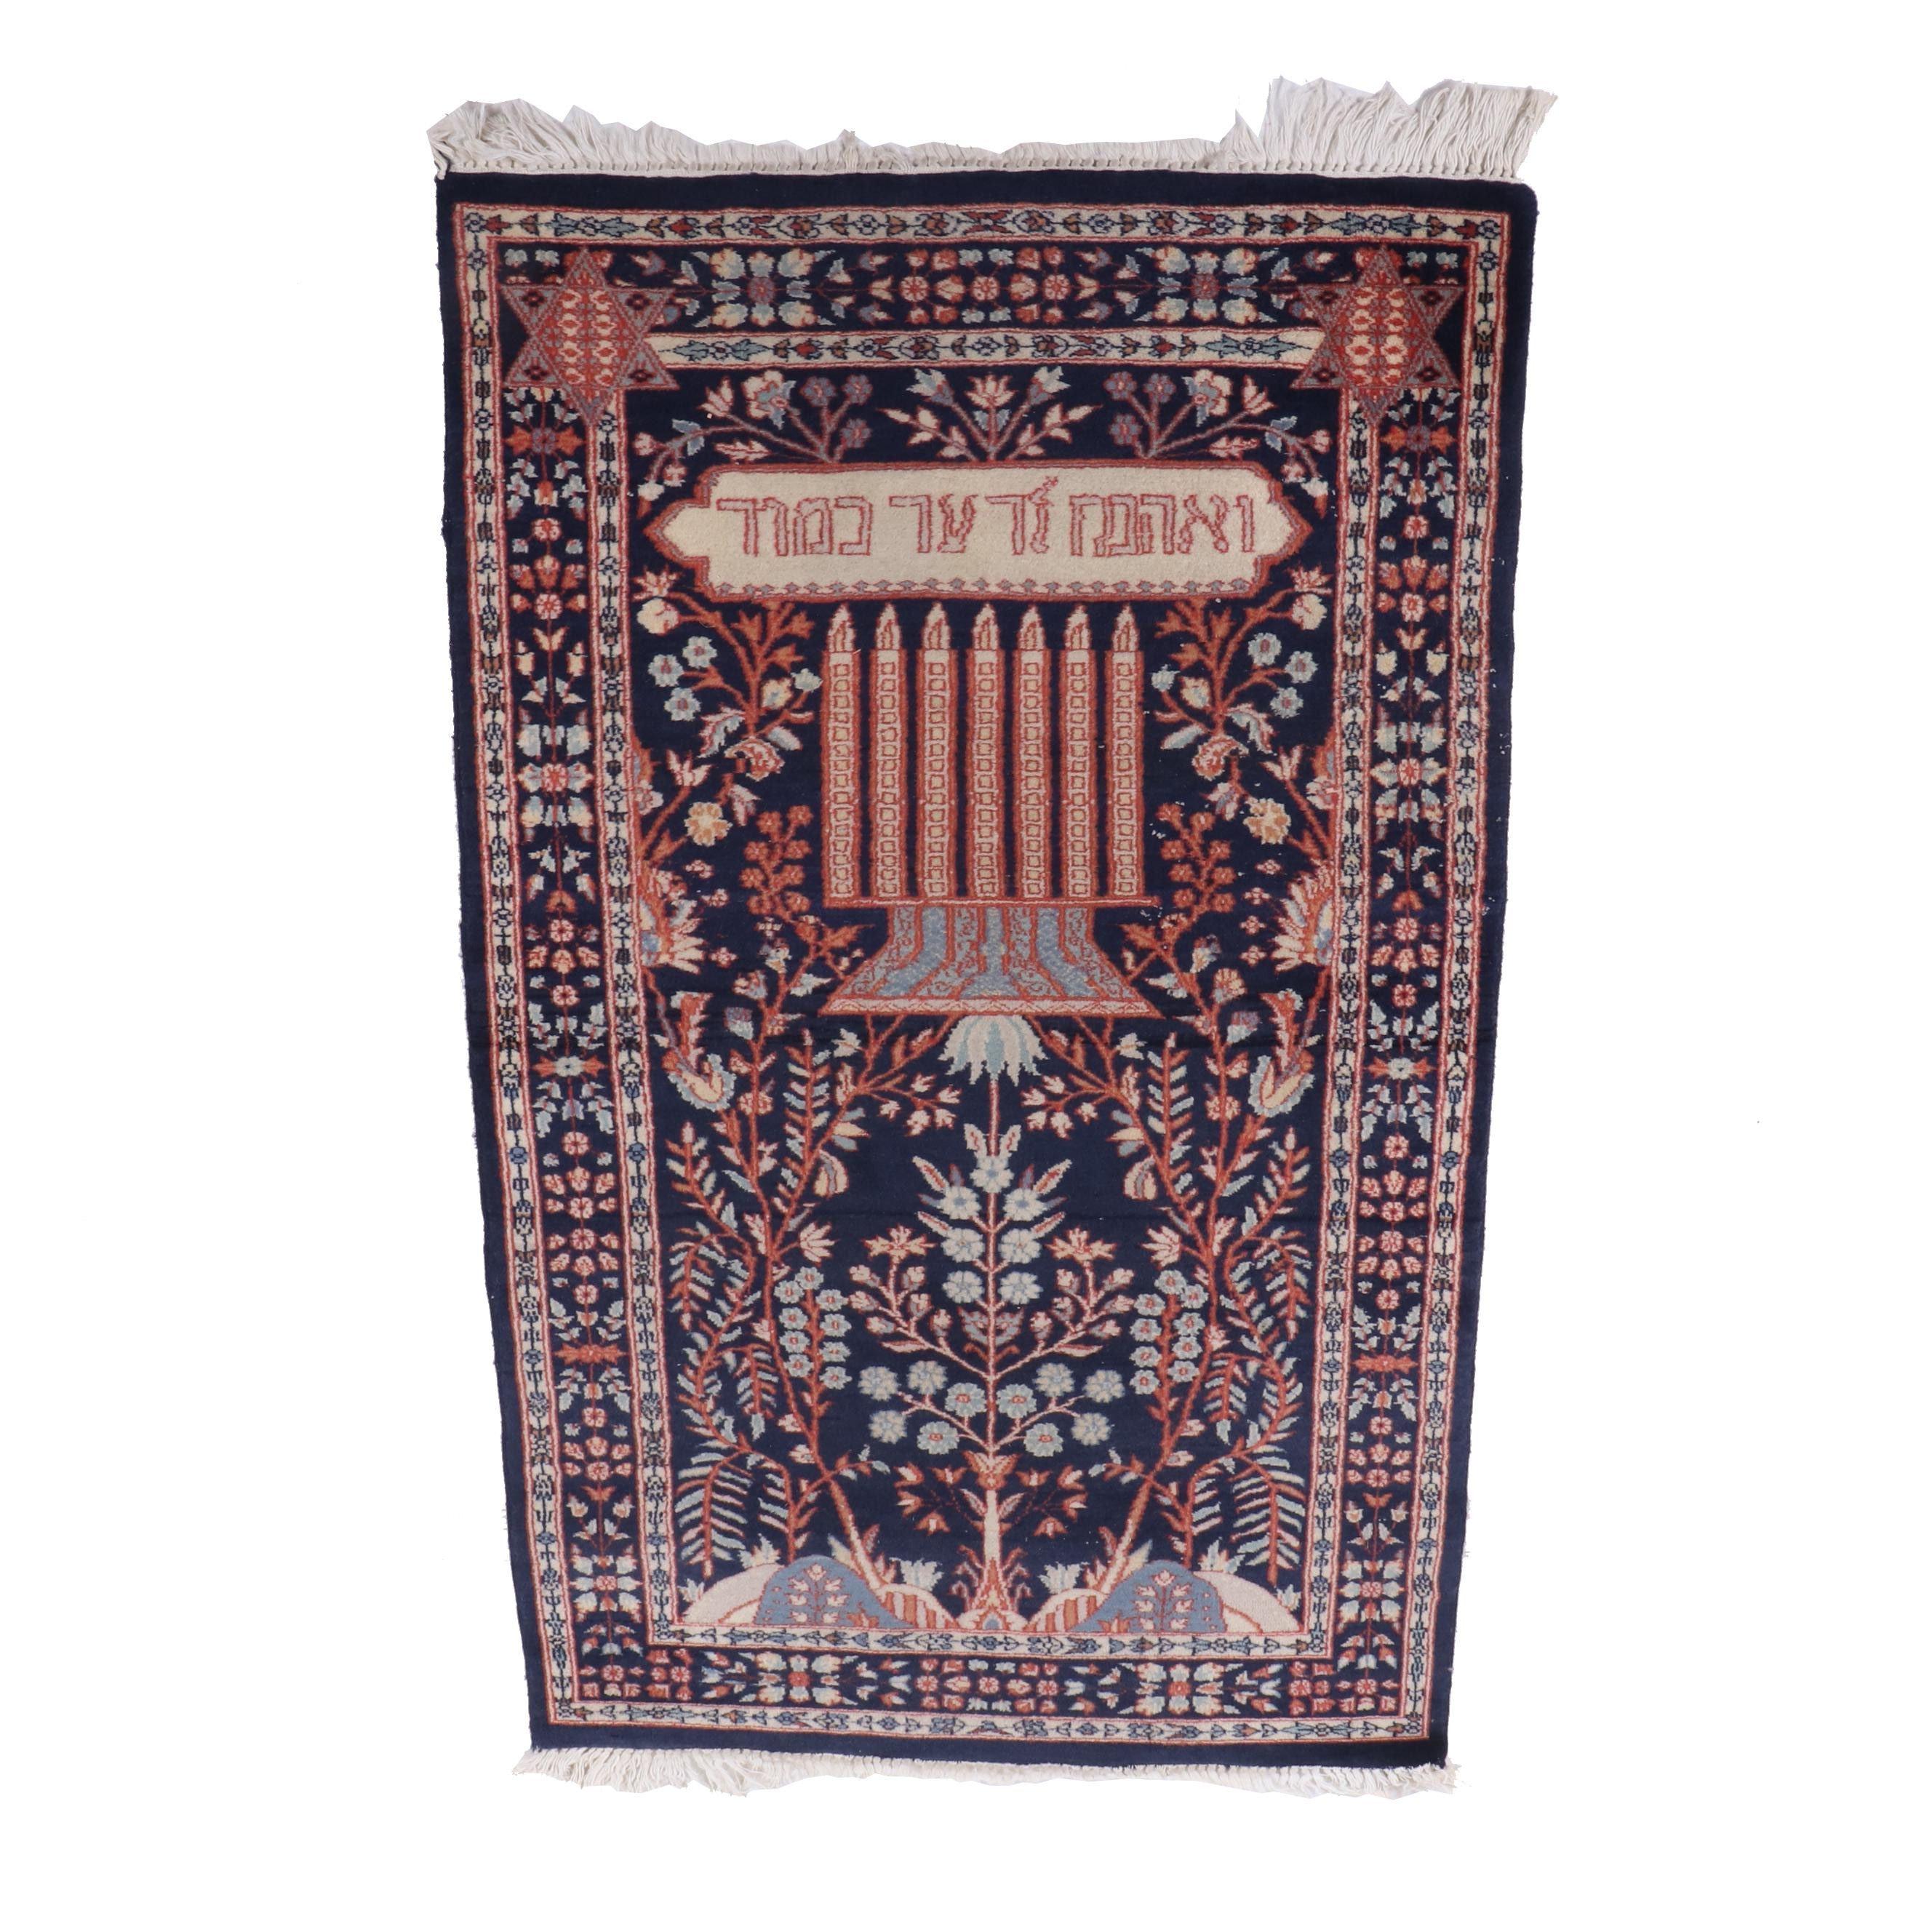 Hand-Knotted Indo-Persian Inscribed Hebrew Halacha/Prayer Rug